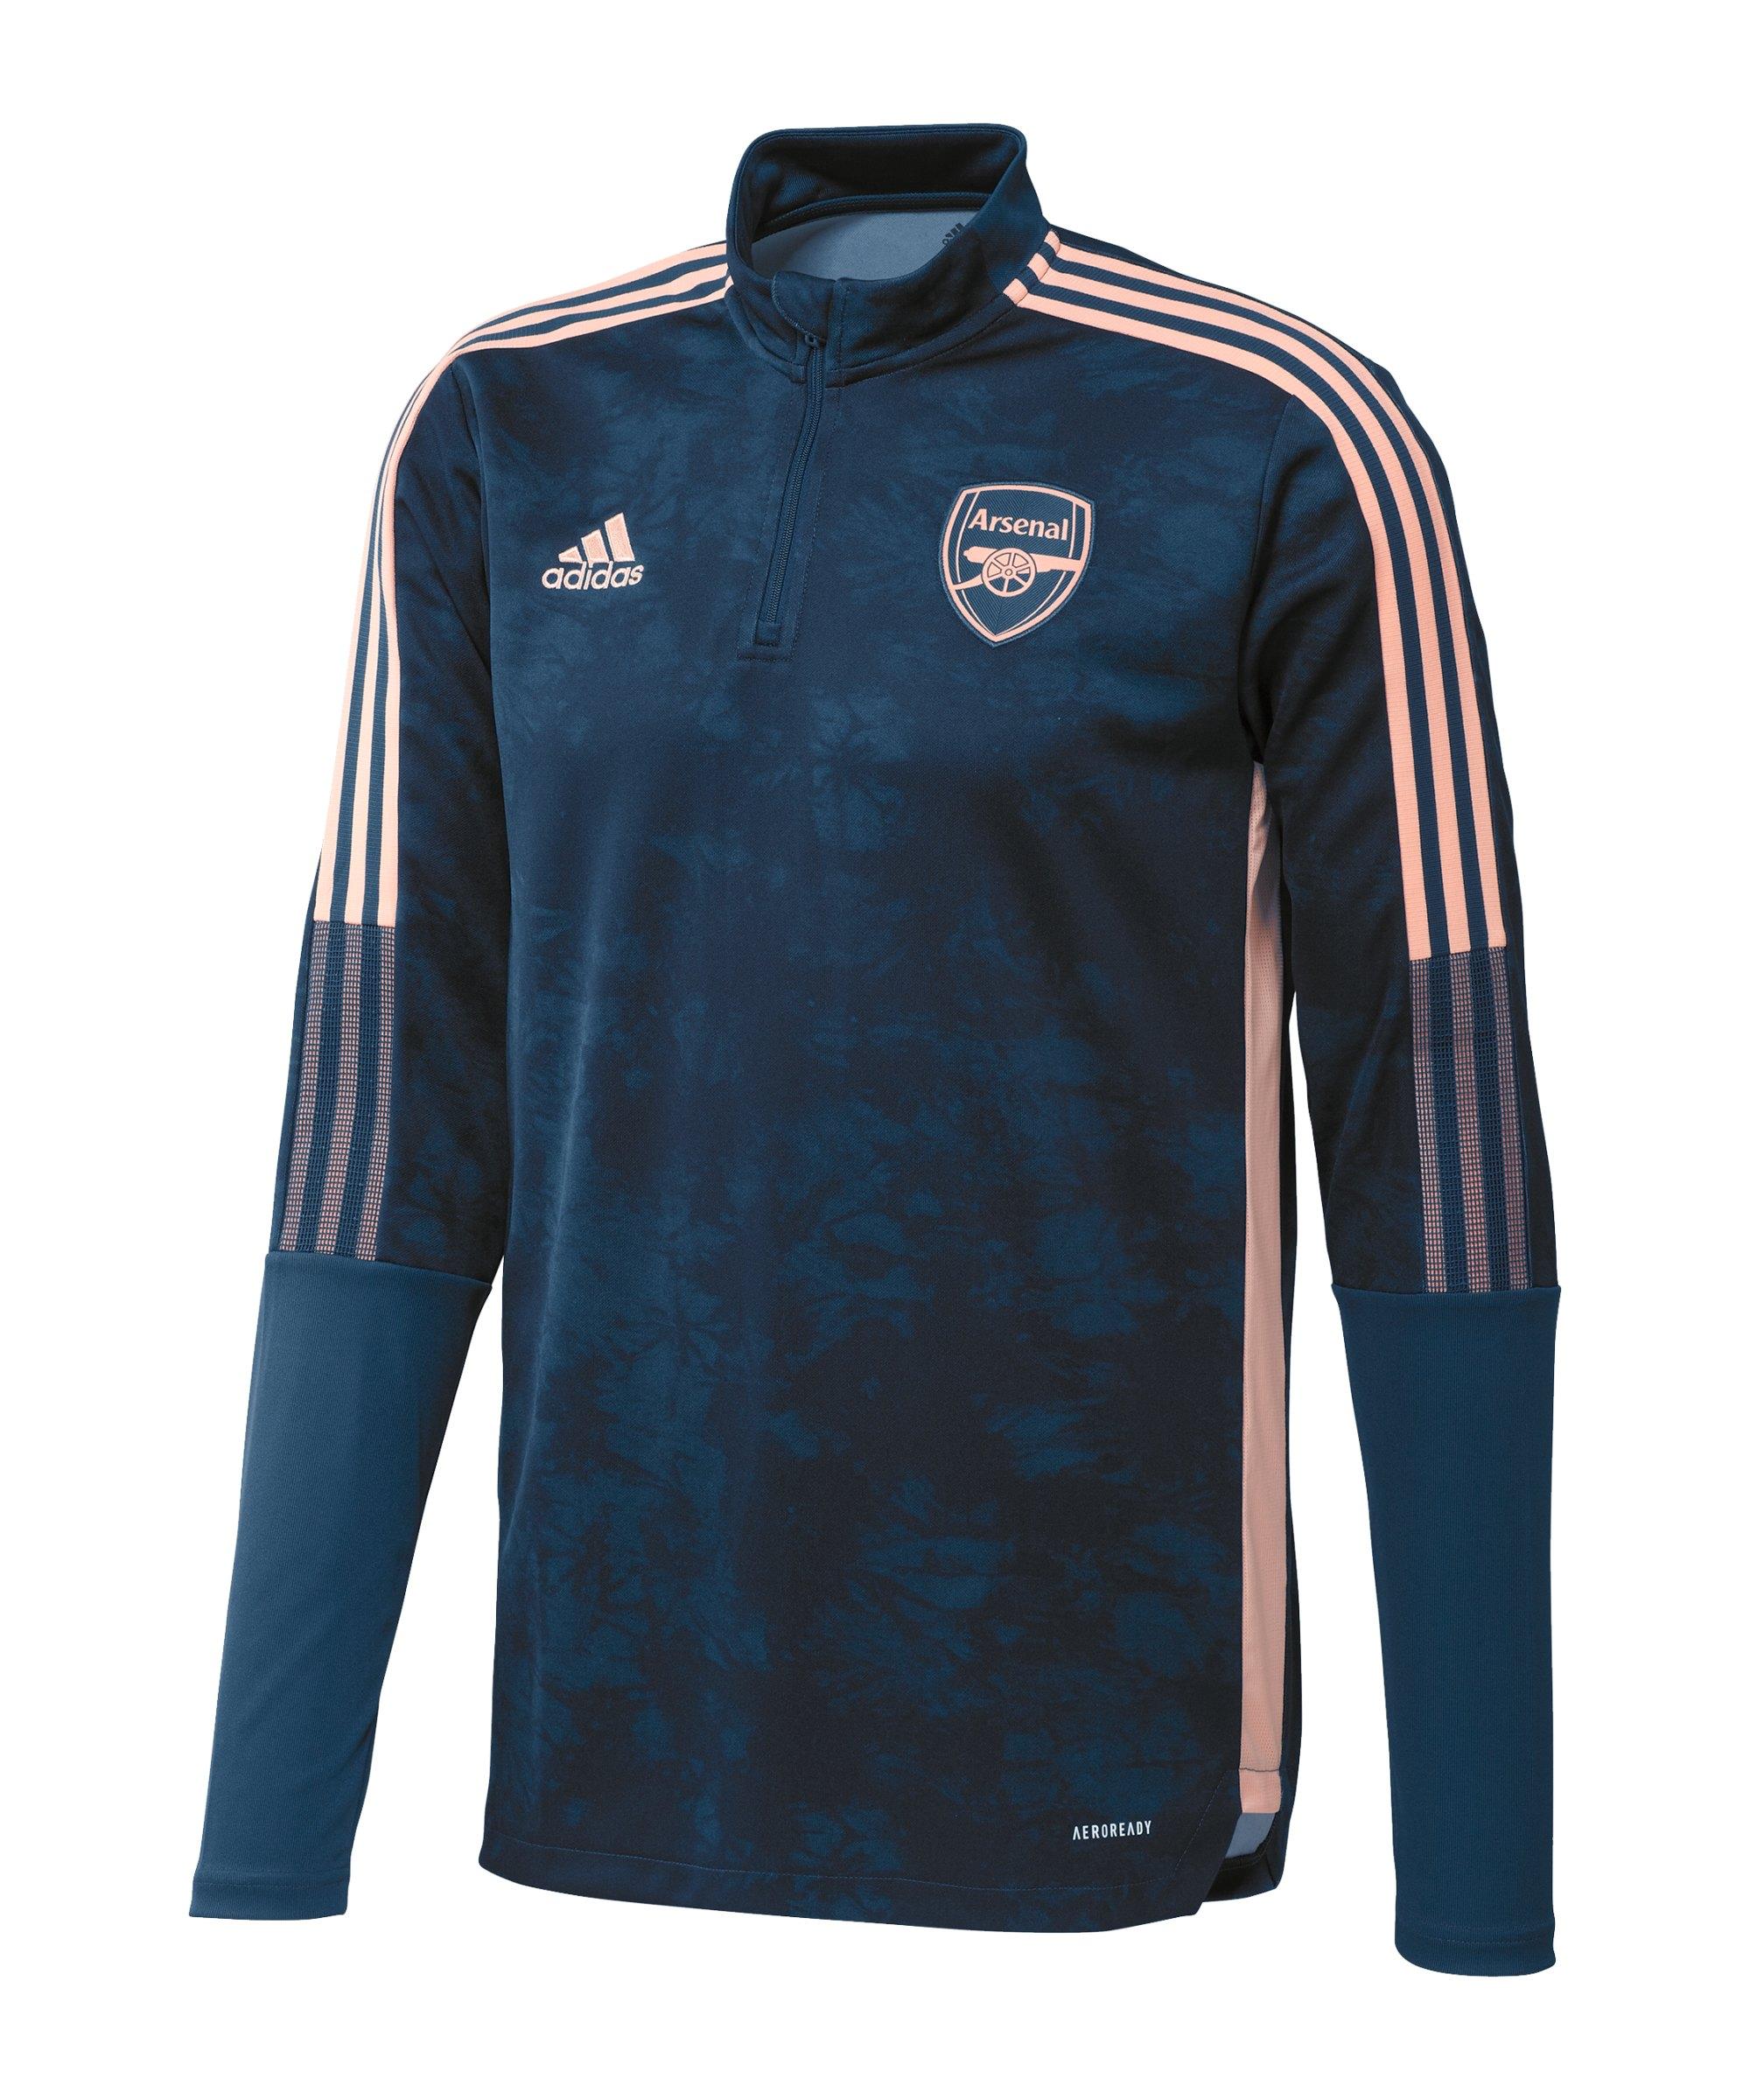 adidas FC Arsenal London UCL Trainingstop Schwarz - schwarz